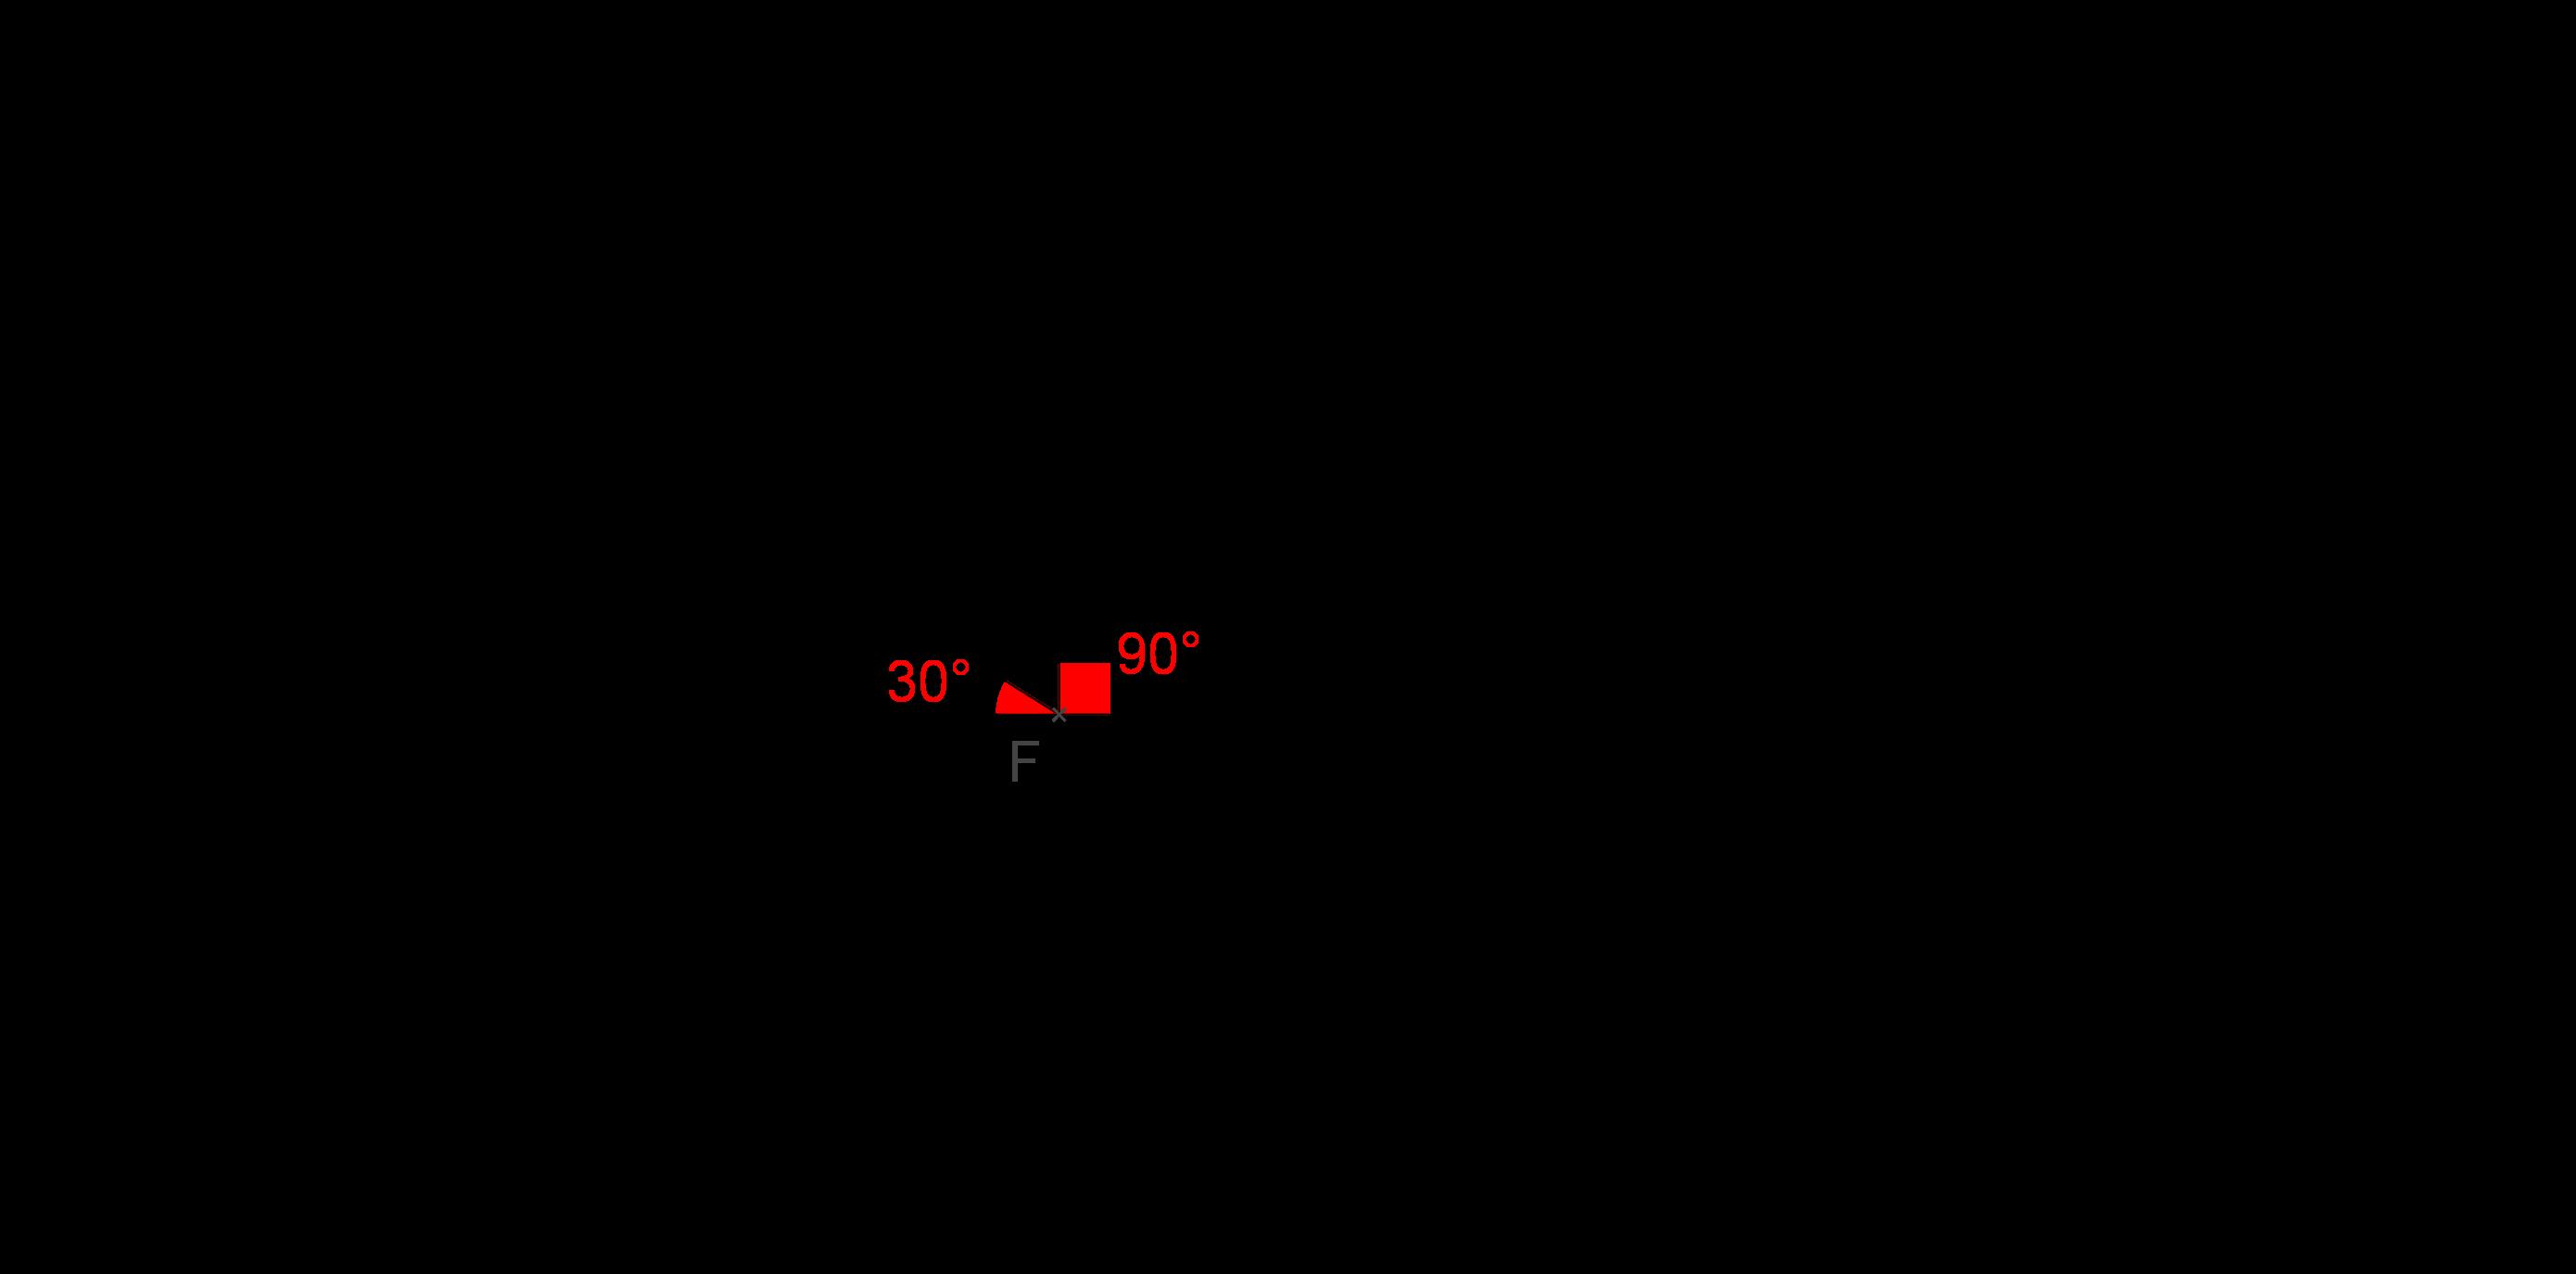 Mathplace angle03 Exercice 1 : calcul d'angles